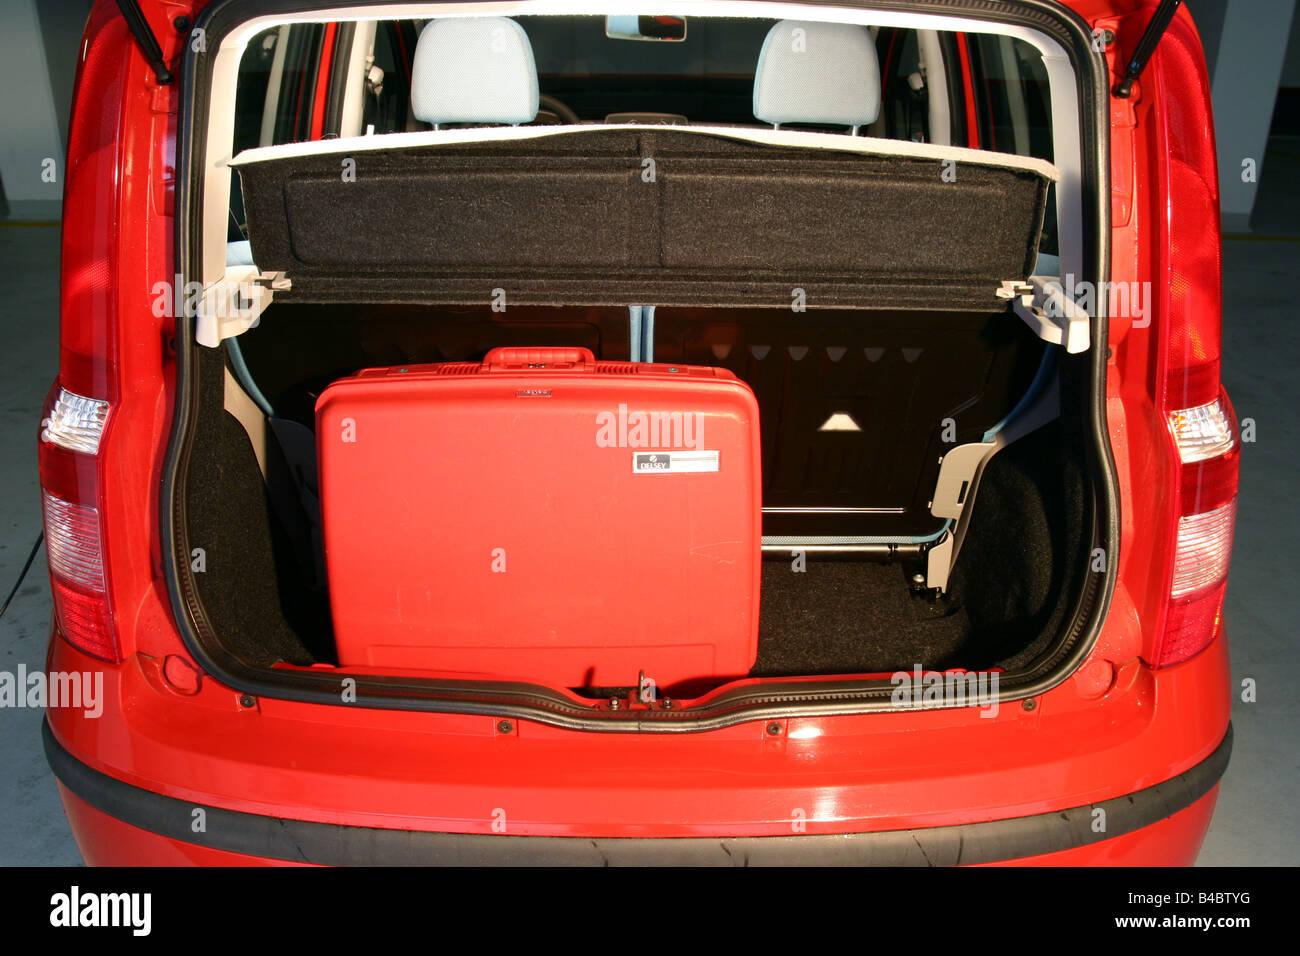 auto fiat panda 1 2 8v emotion miniapprox s limousine. Black Bedroom Furniture Sets. Home Design Ideas